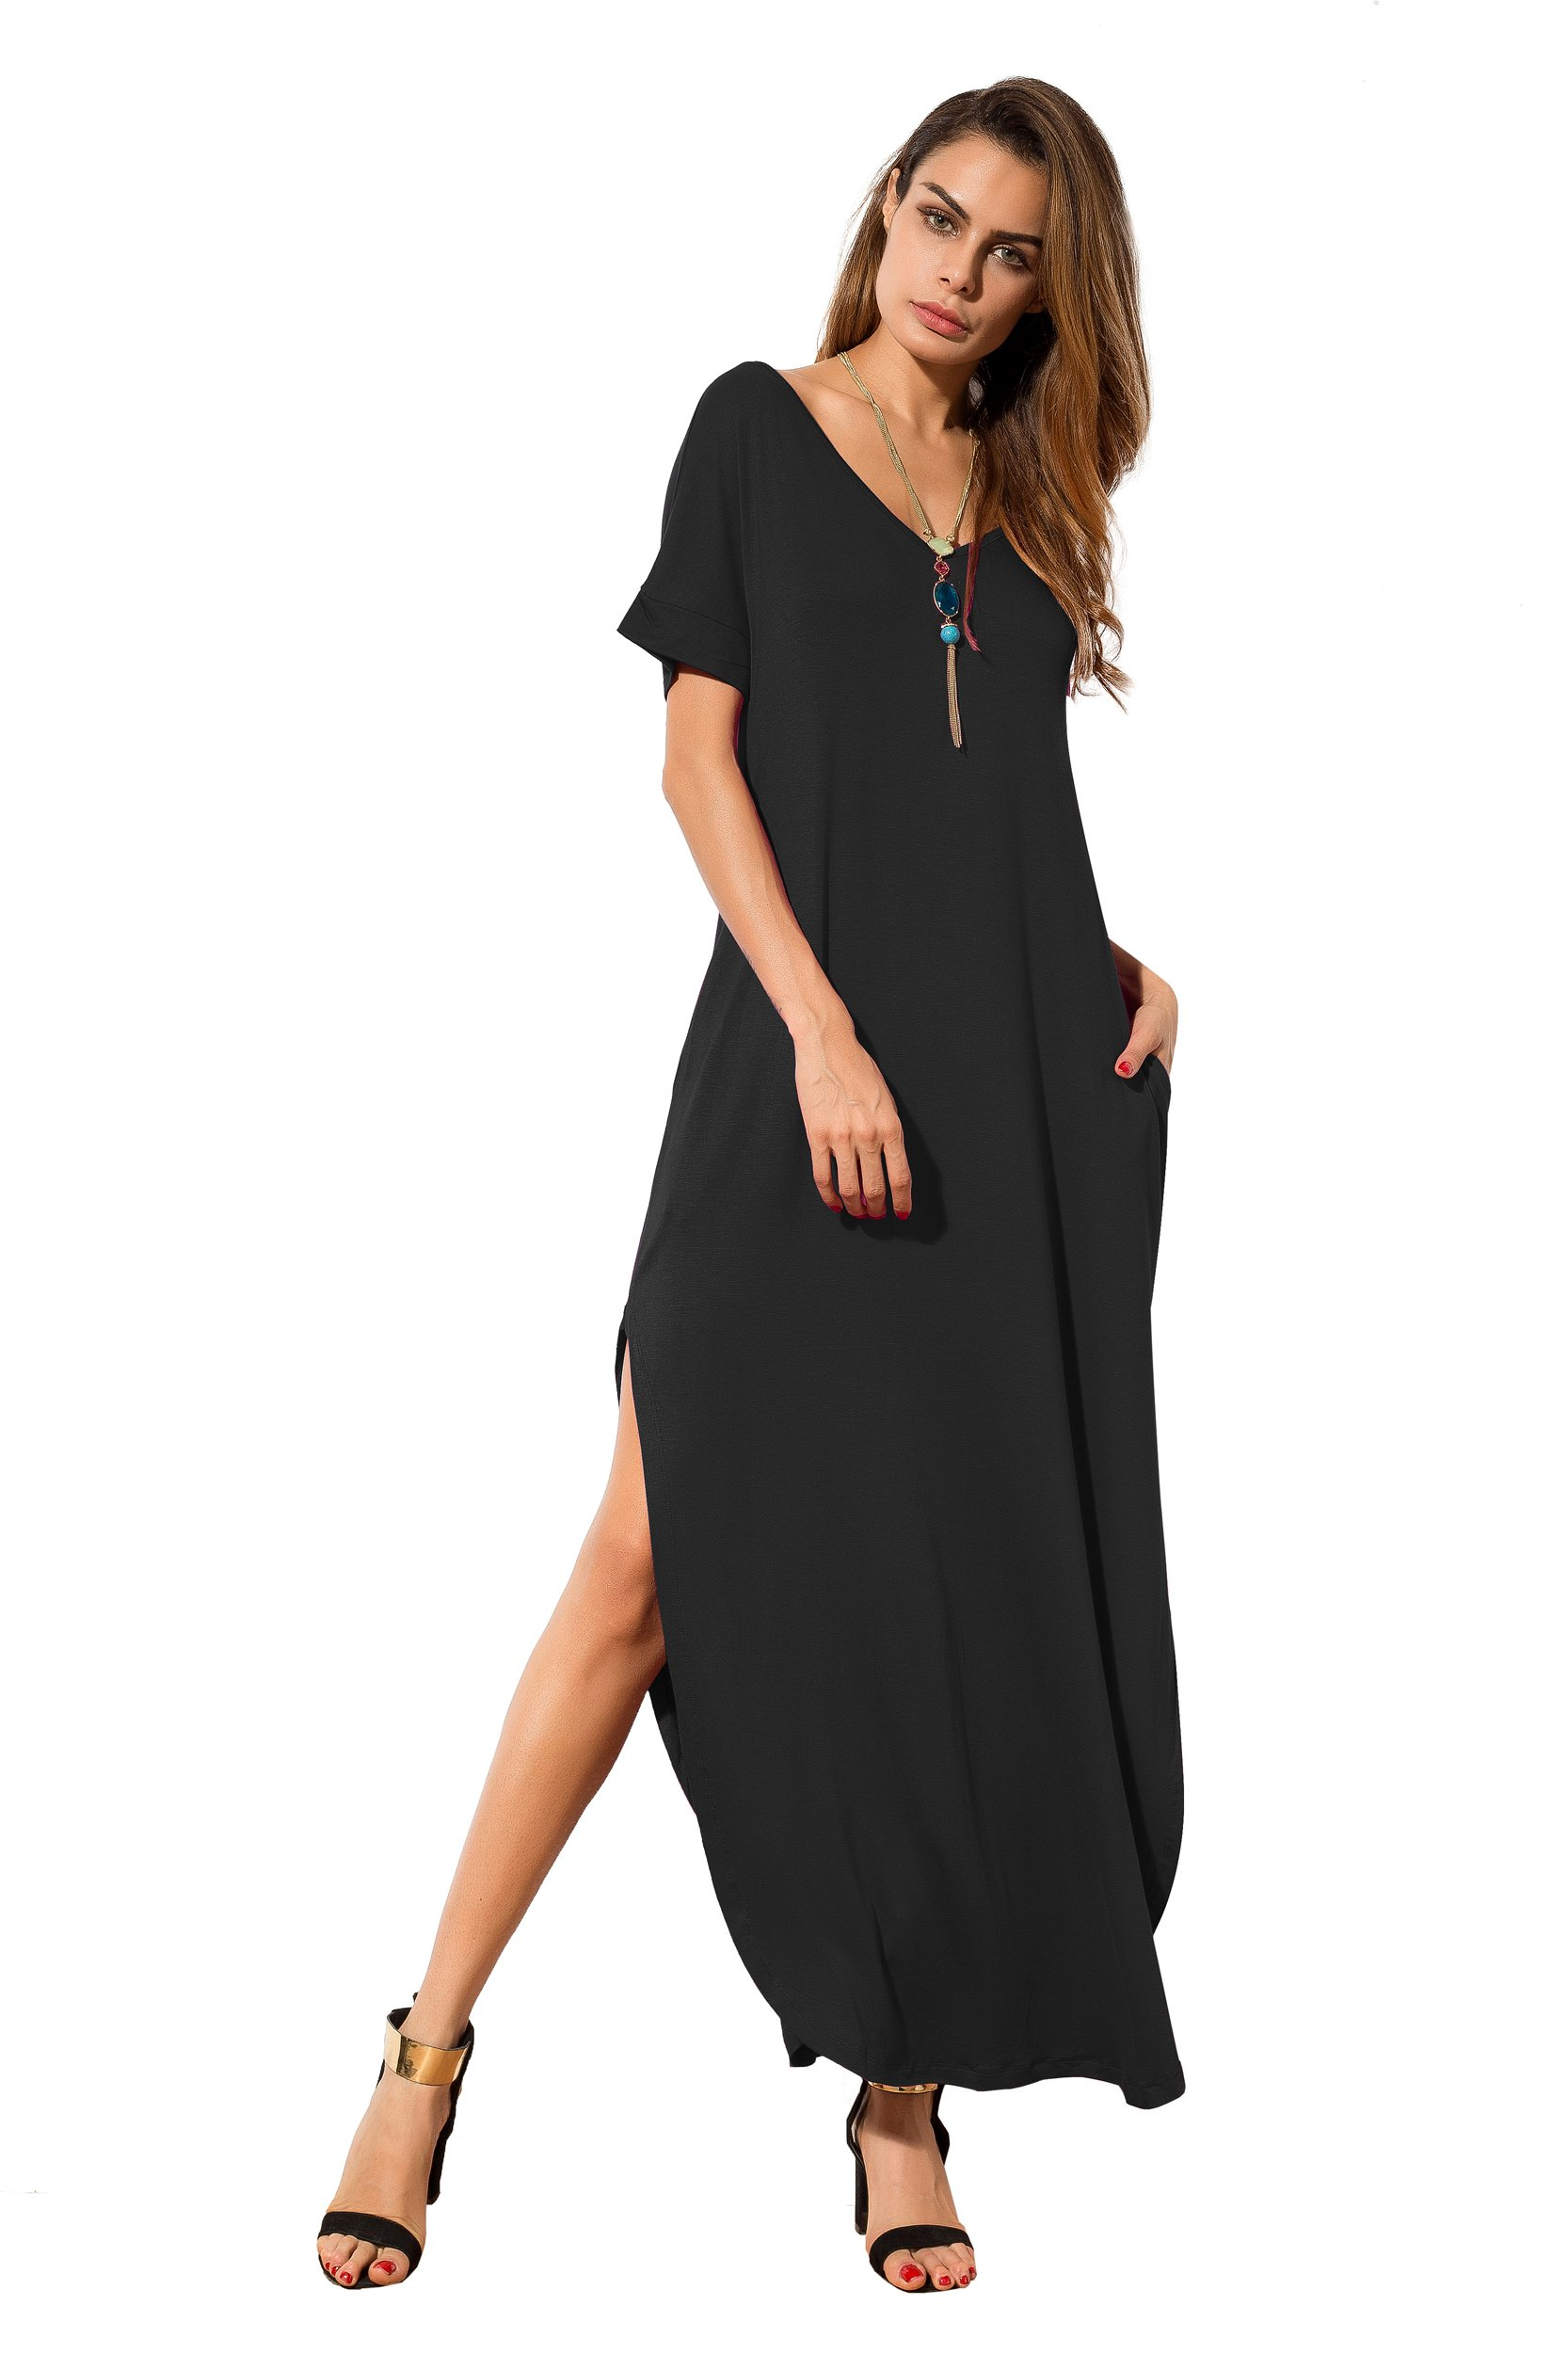 Women's Casual Loose Pocket Long Dress | Short Sleeve ...